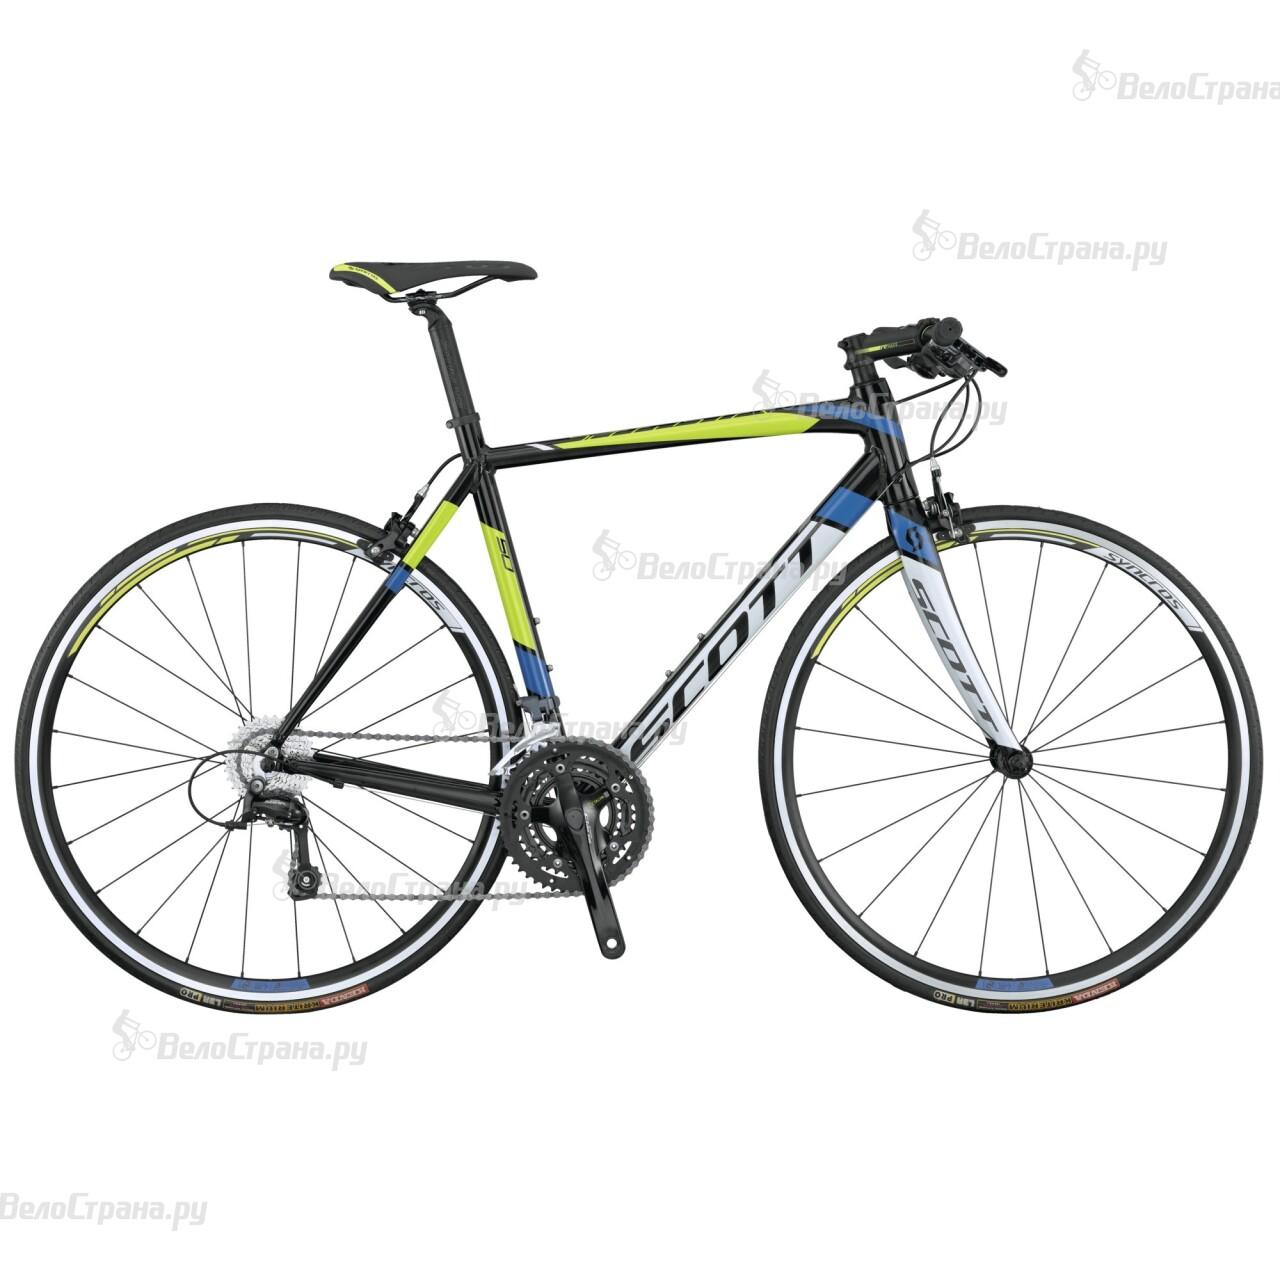 Велосипед Scott Speedster 50 FB (24) (2015)